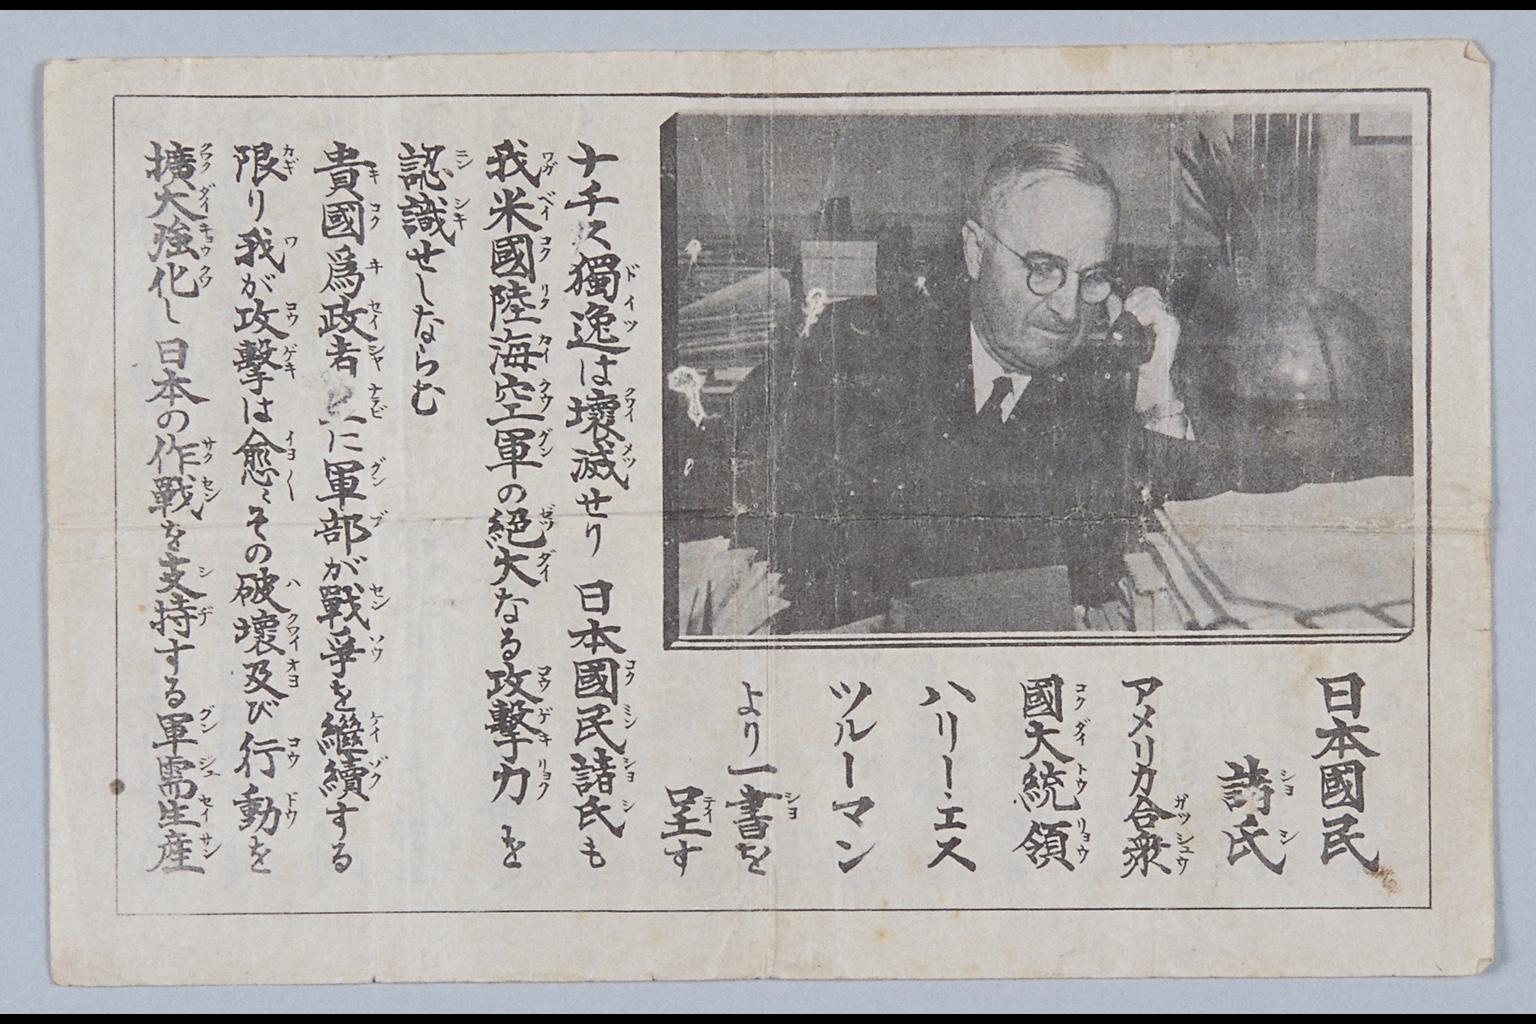 http://www.ndl.go.jp/constitution/shiryo/01/img_l/008-001l.jpg